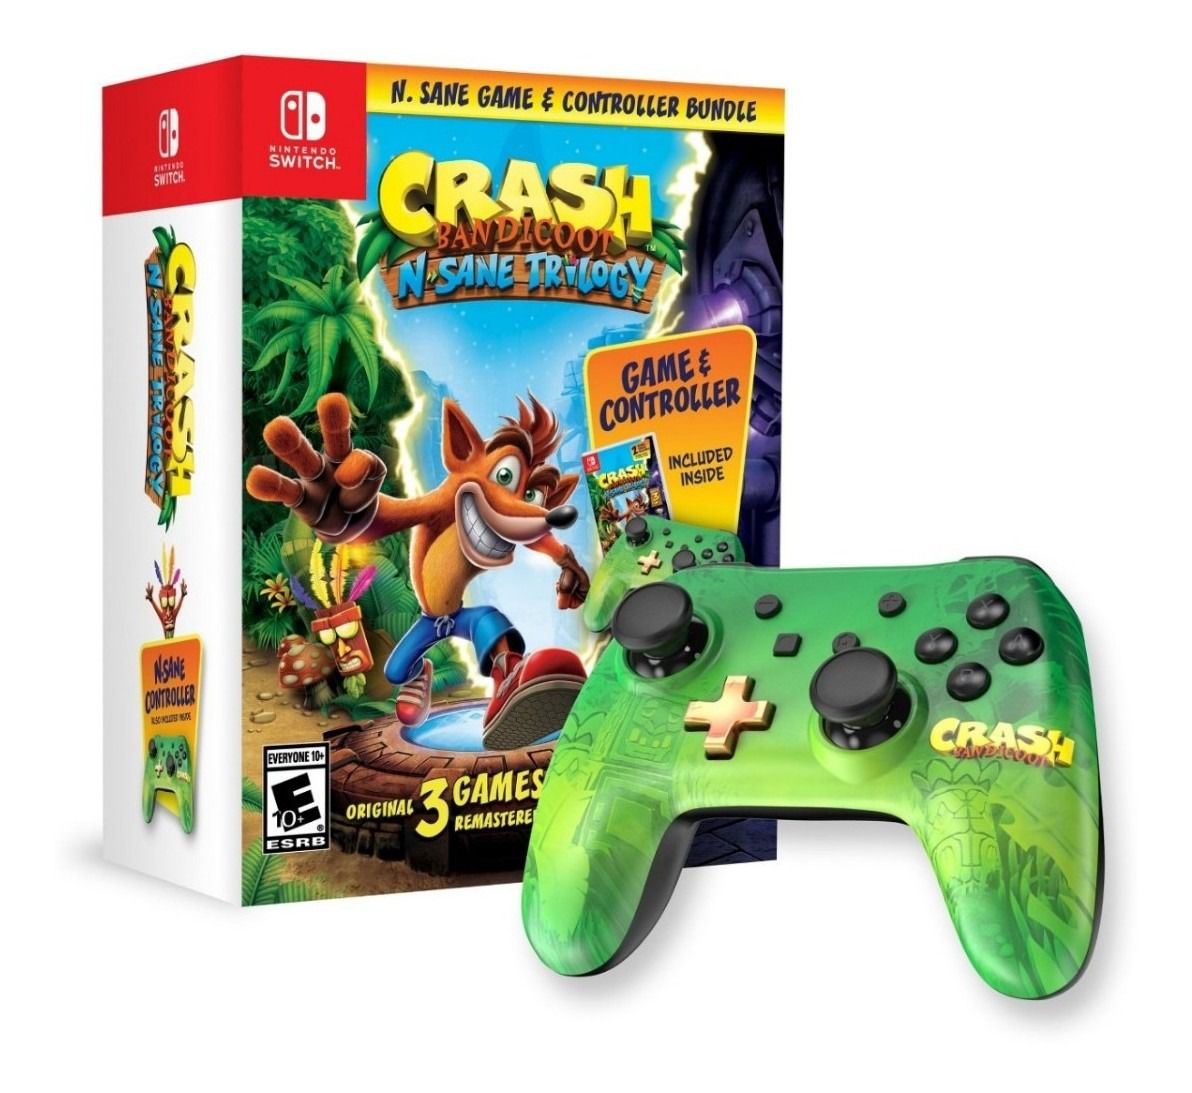 Crash Bandicoot: N. Sane Trilogy & Controller Bundle - Nintendo Switch